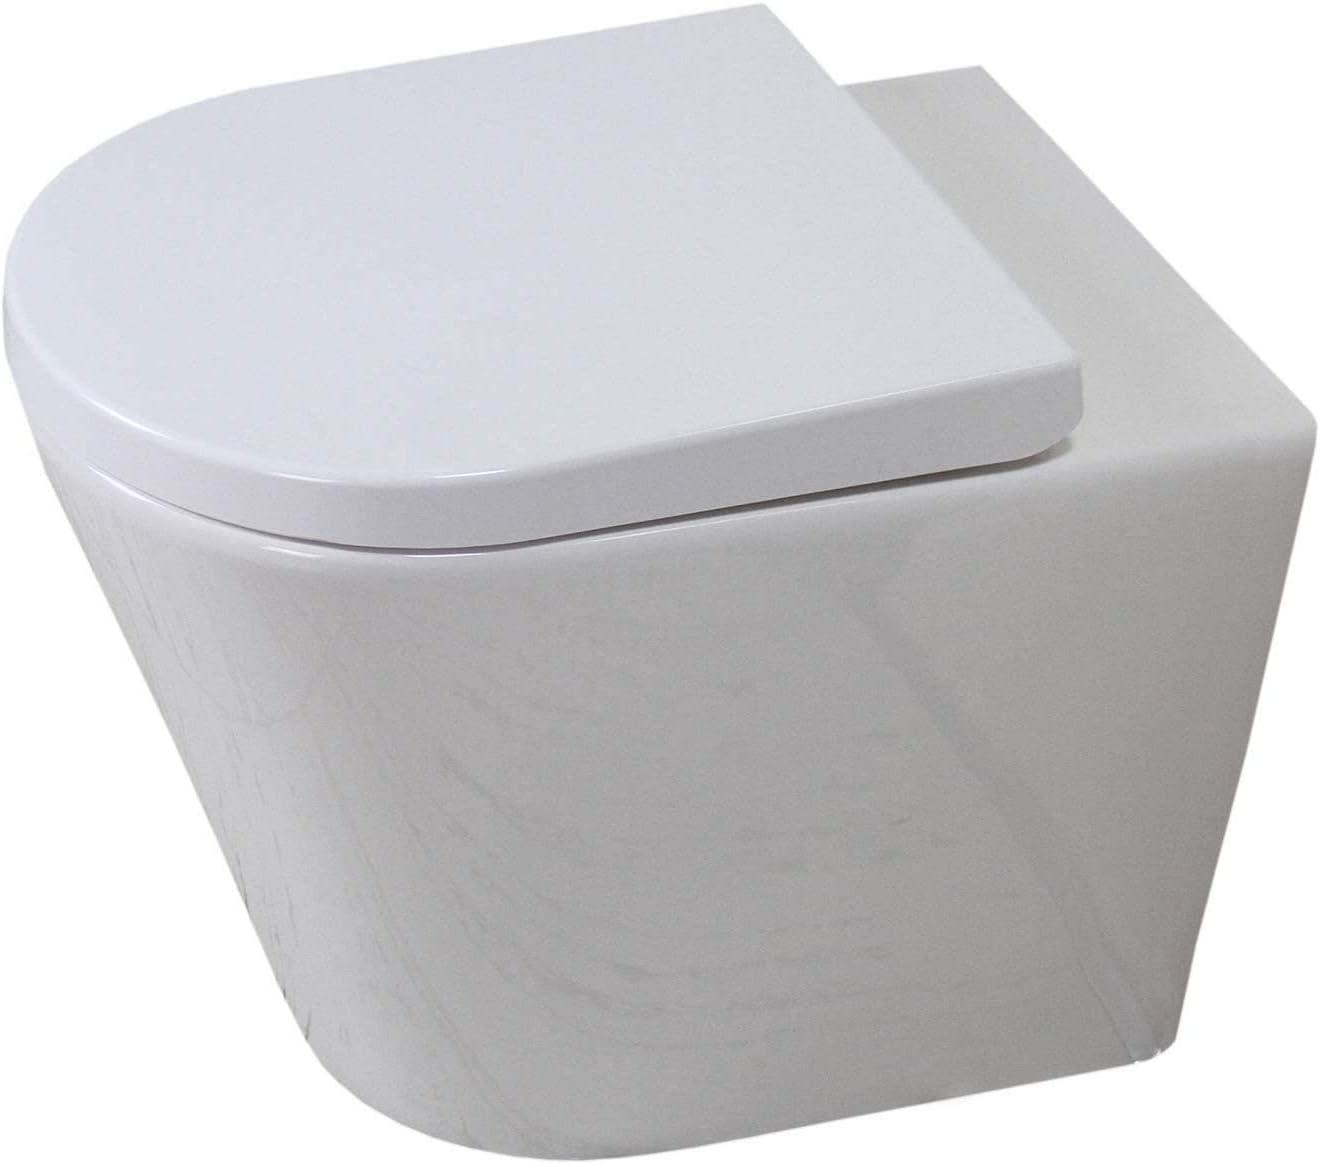 KLARA Toilet WC Bathroom Back to Wall Ceramic Soft Closing Seat